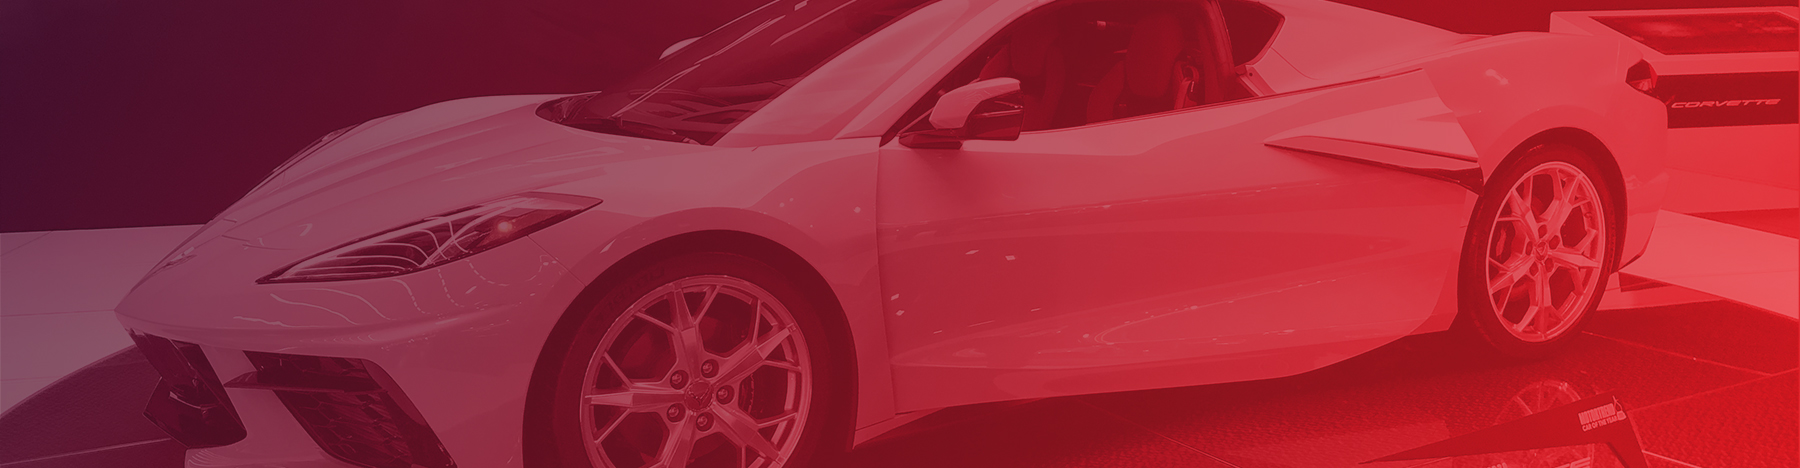 Establishing a new order with the C8 Corvette